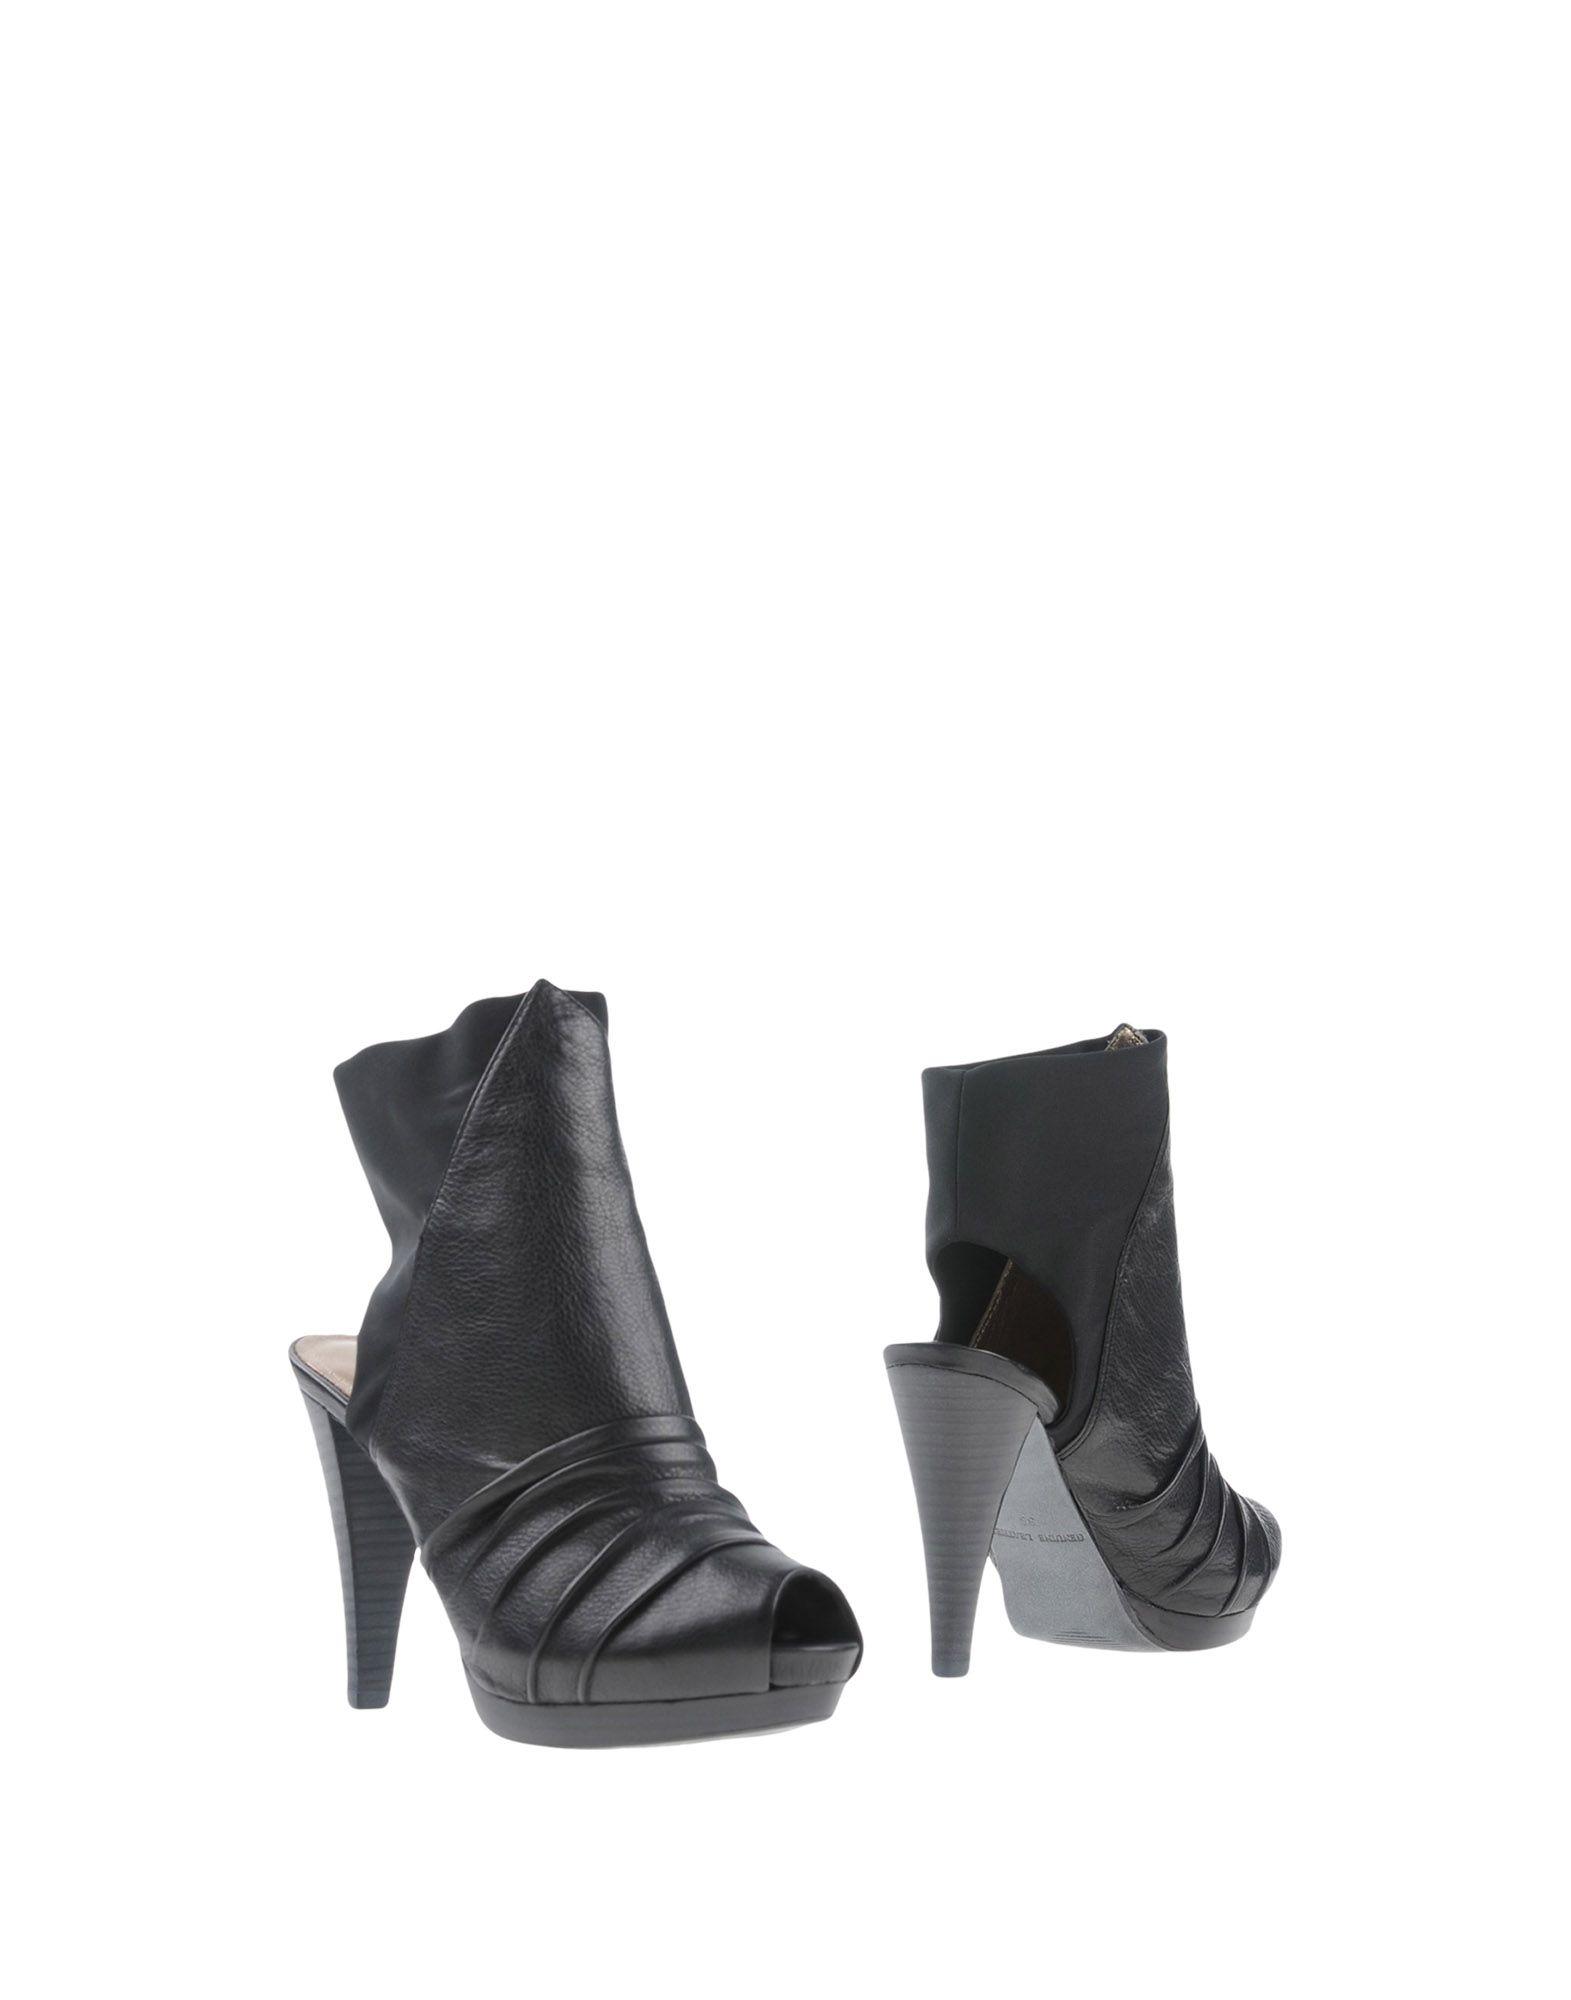 Cafènoir Stiefelette Damen  11351298WC Gute Qualität beliebte Schuhe